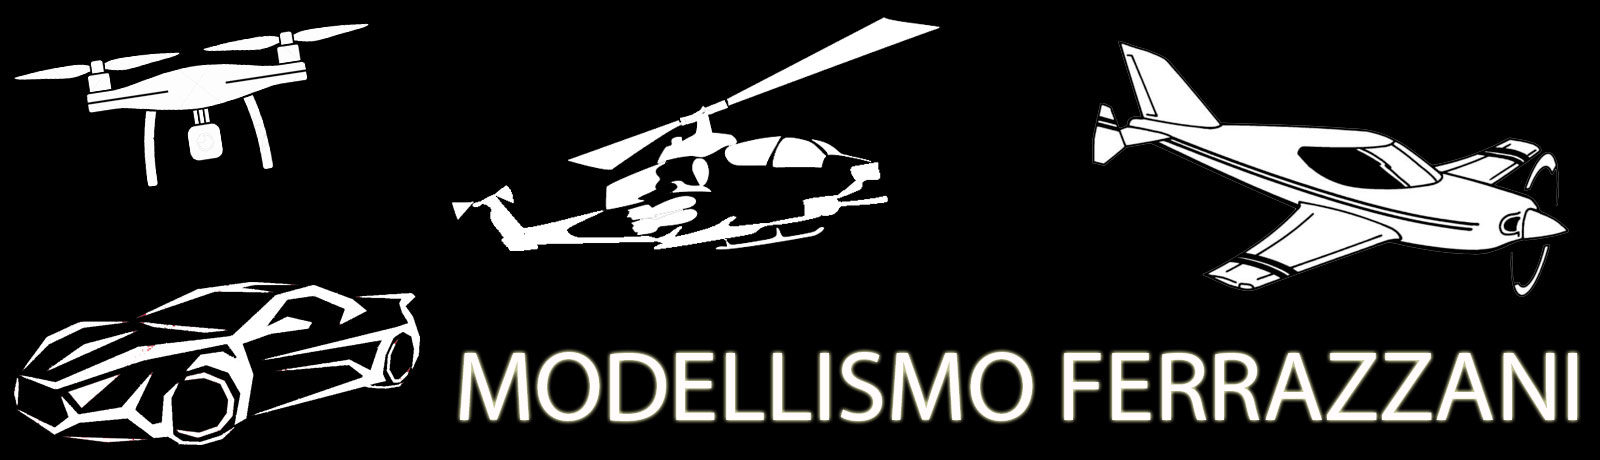 Modellismo Ferrazzani